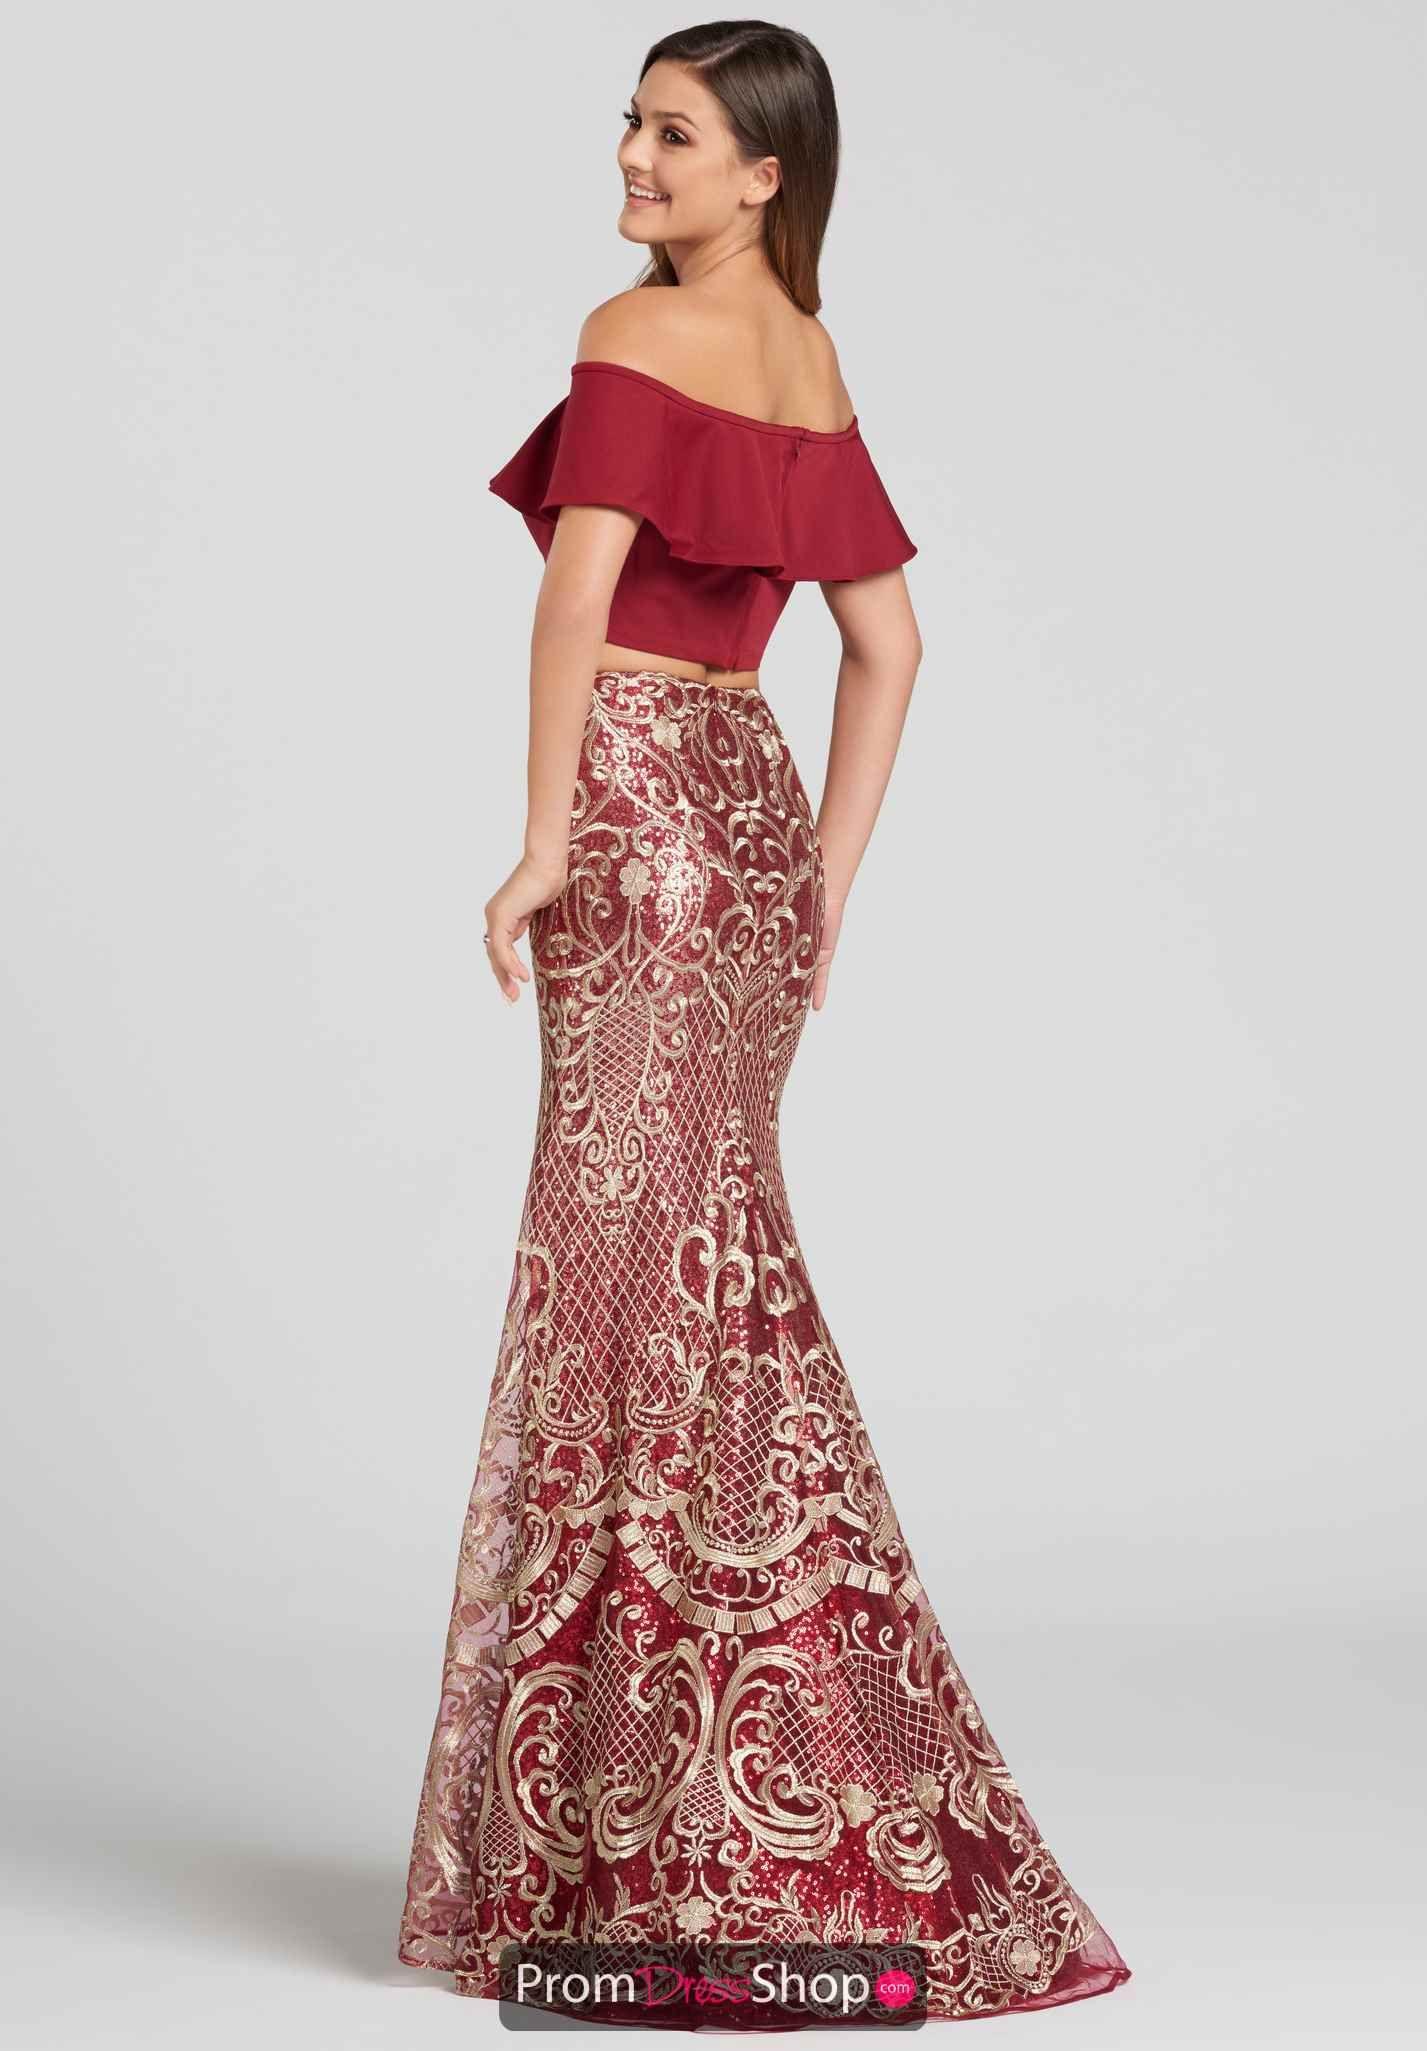 Wine Gold Dresses Prom Dresses Ellie Wilde